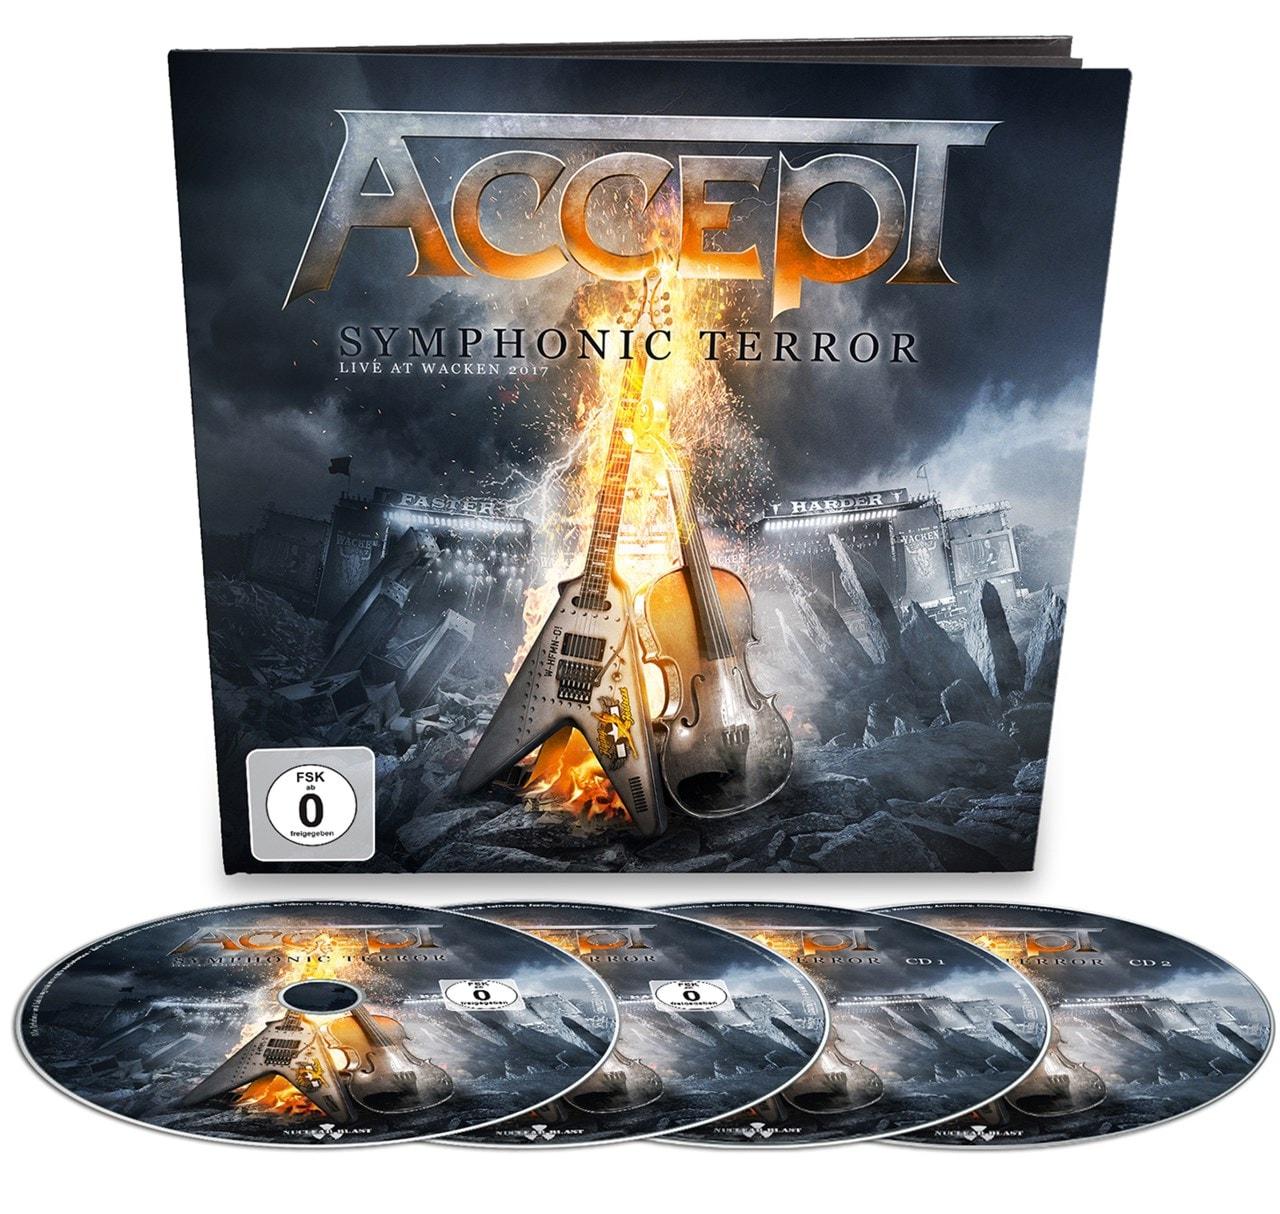 Accept: Symphonic Terror - Live at Wacken 2017 - 1